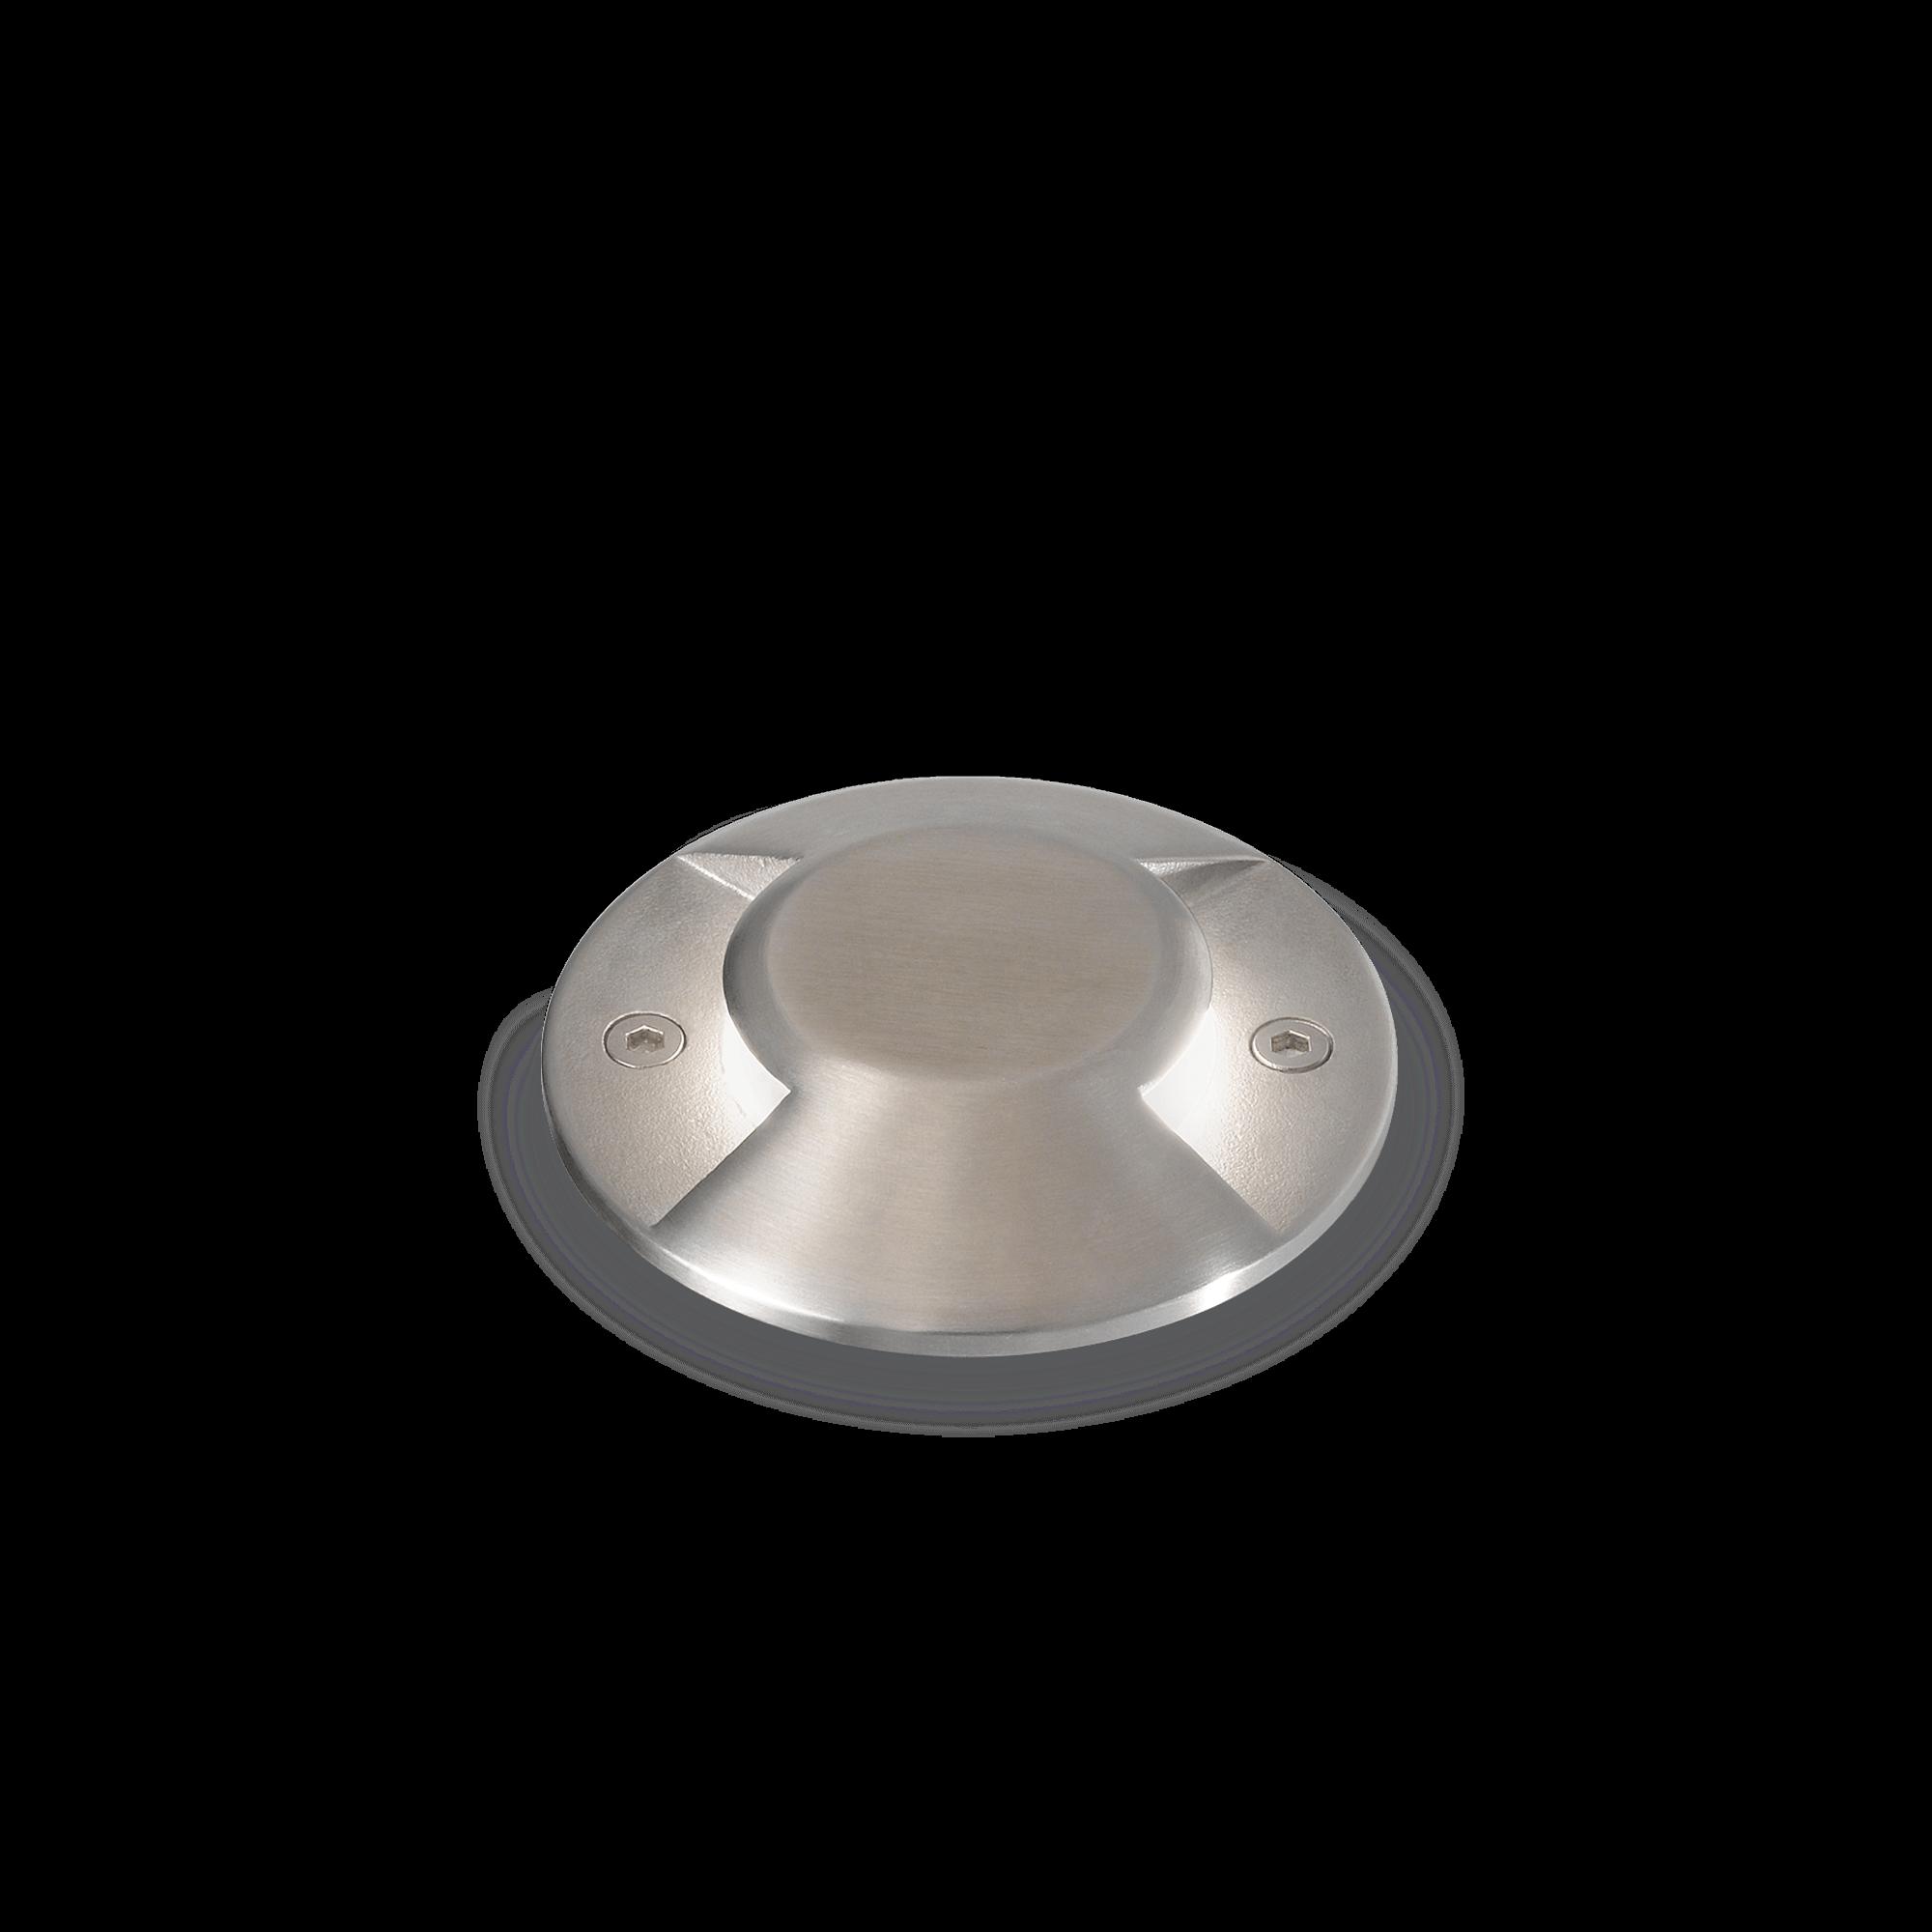 Exteriérové zápustné svítidlo Ideal lux 122021 ROCKET-2 PT1 1xLED 3W / 200lm 4000K IP65